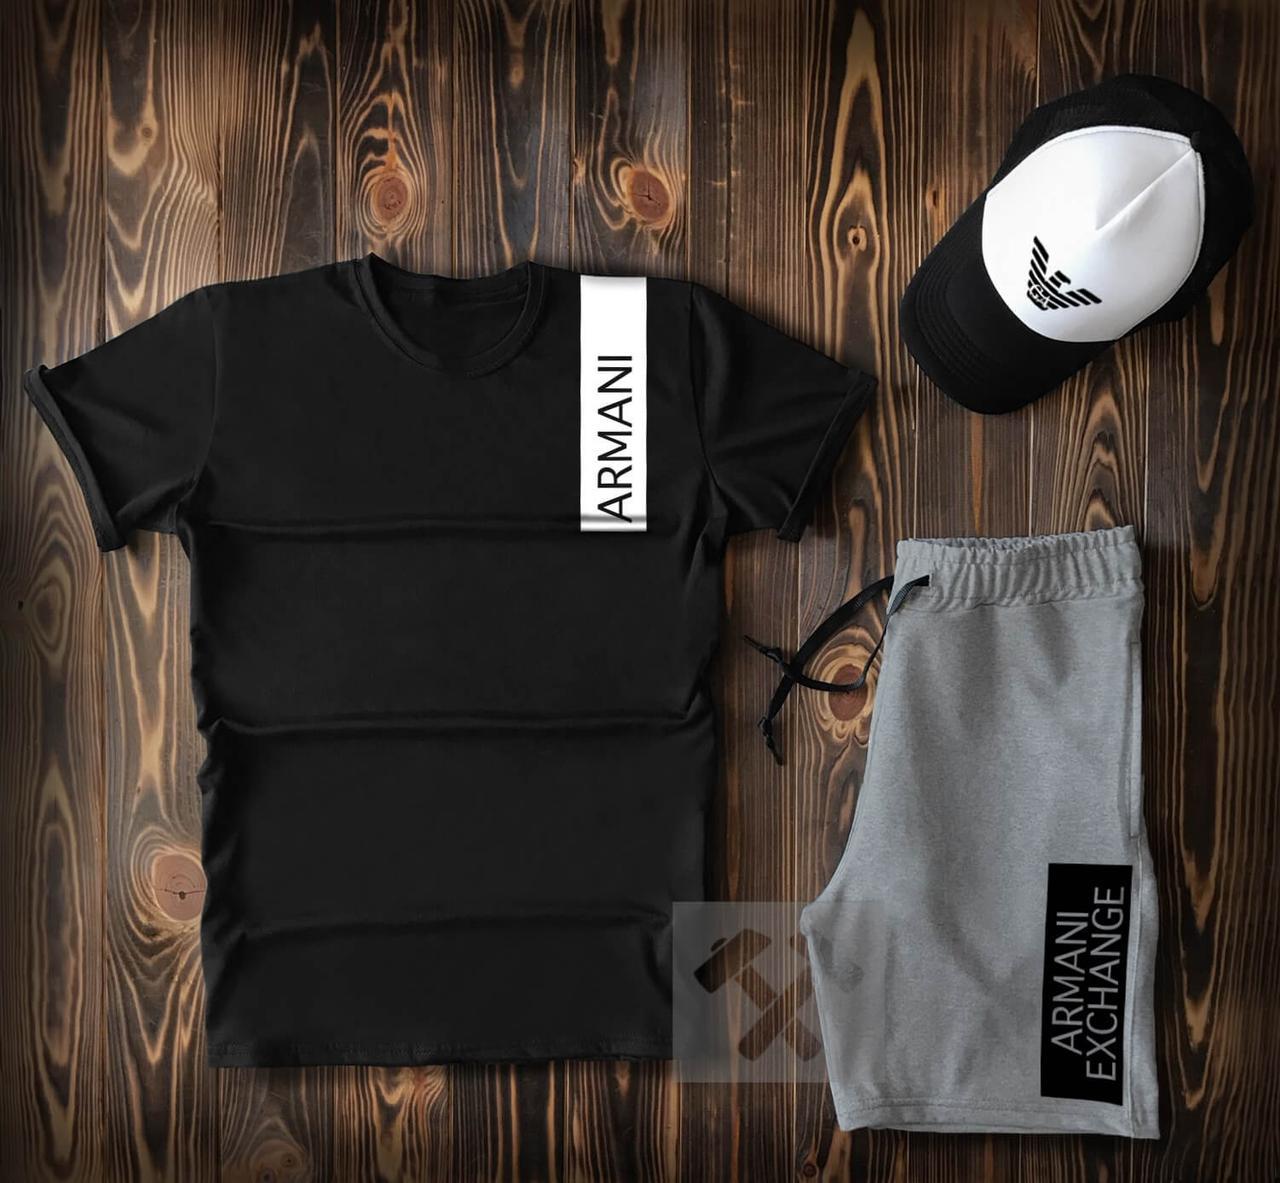 Купить Костюм 3 в 1 на лето Armani Black Grey (шорты футболка и кепка Армани черно-серый), Armani Jeans